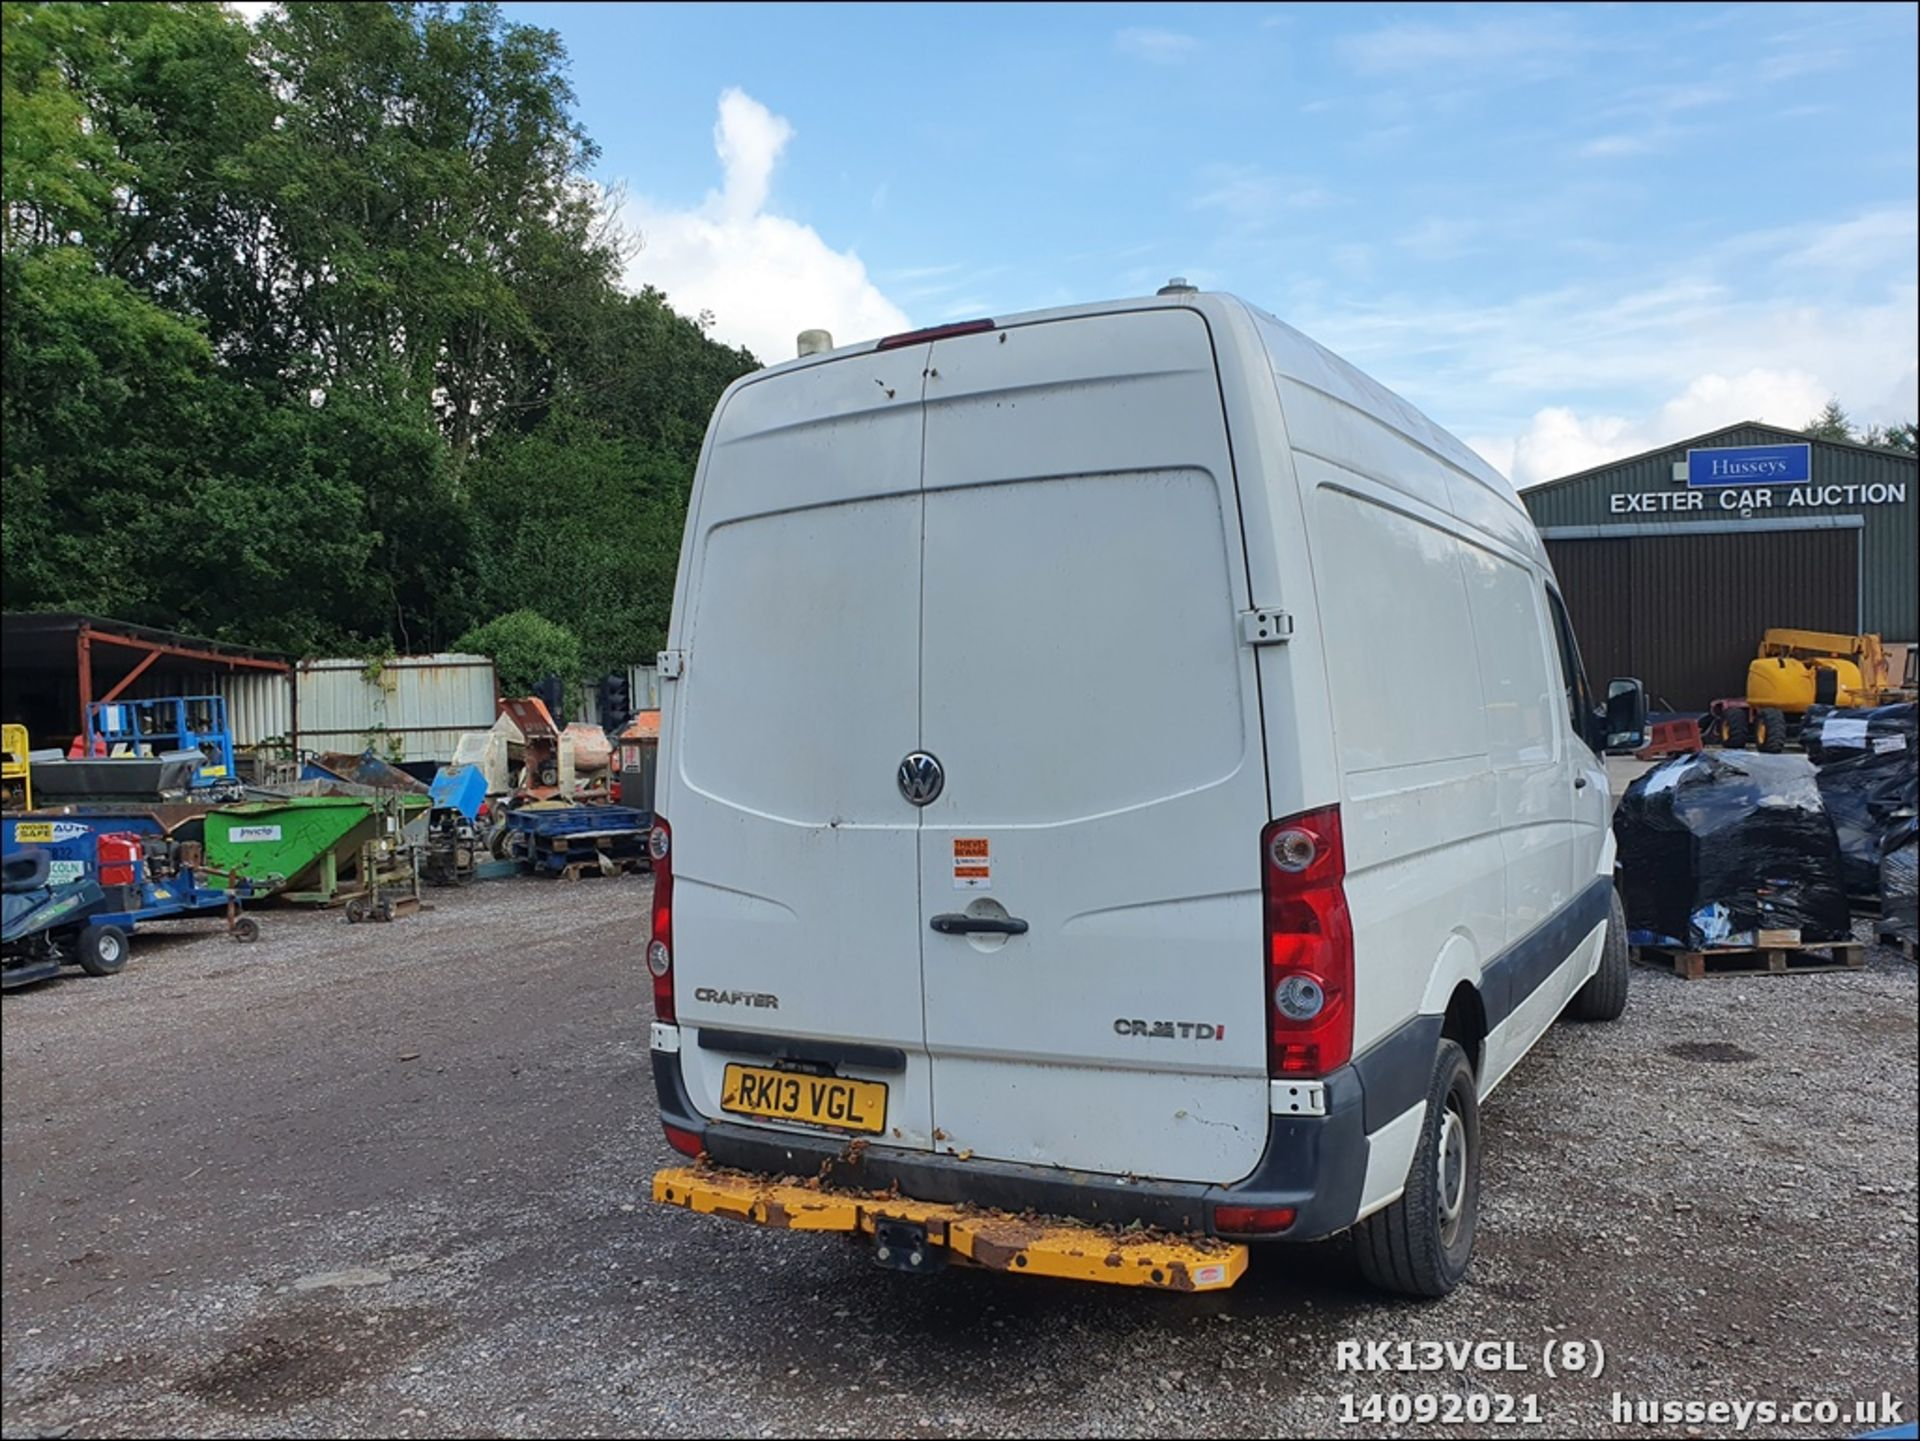 13/13 VOLKSWAGEN CRAFTER CR35 TDI 143 MWB - 1968cc 5dr Van (White, 75k) - Image 8 of 13